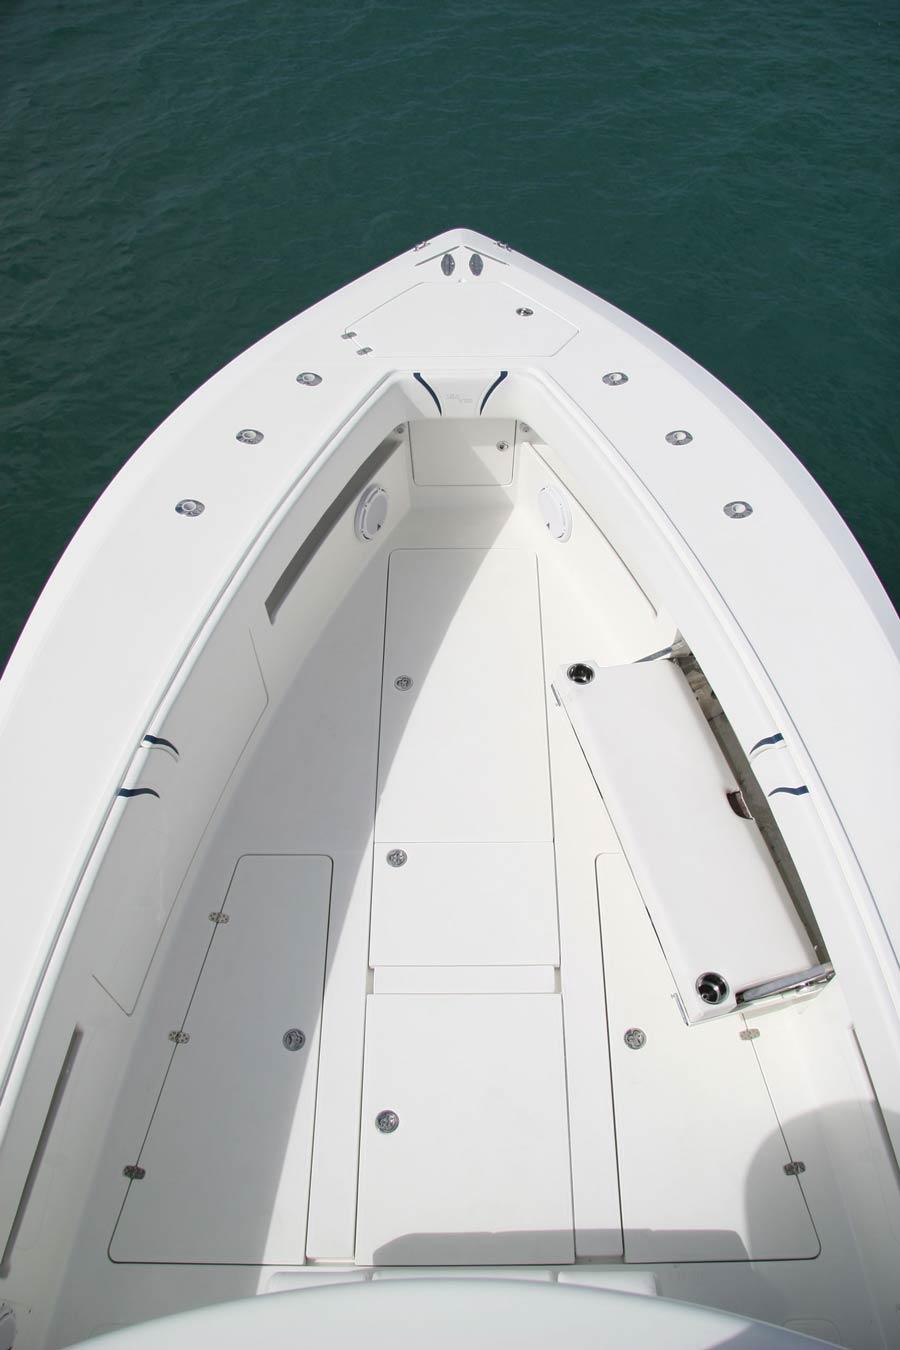 Center Consoles - 390 Model Info - SeaVee Boats